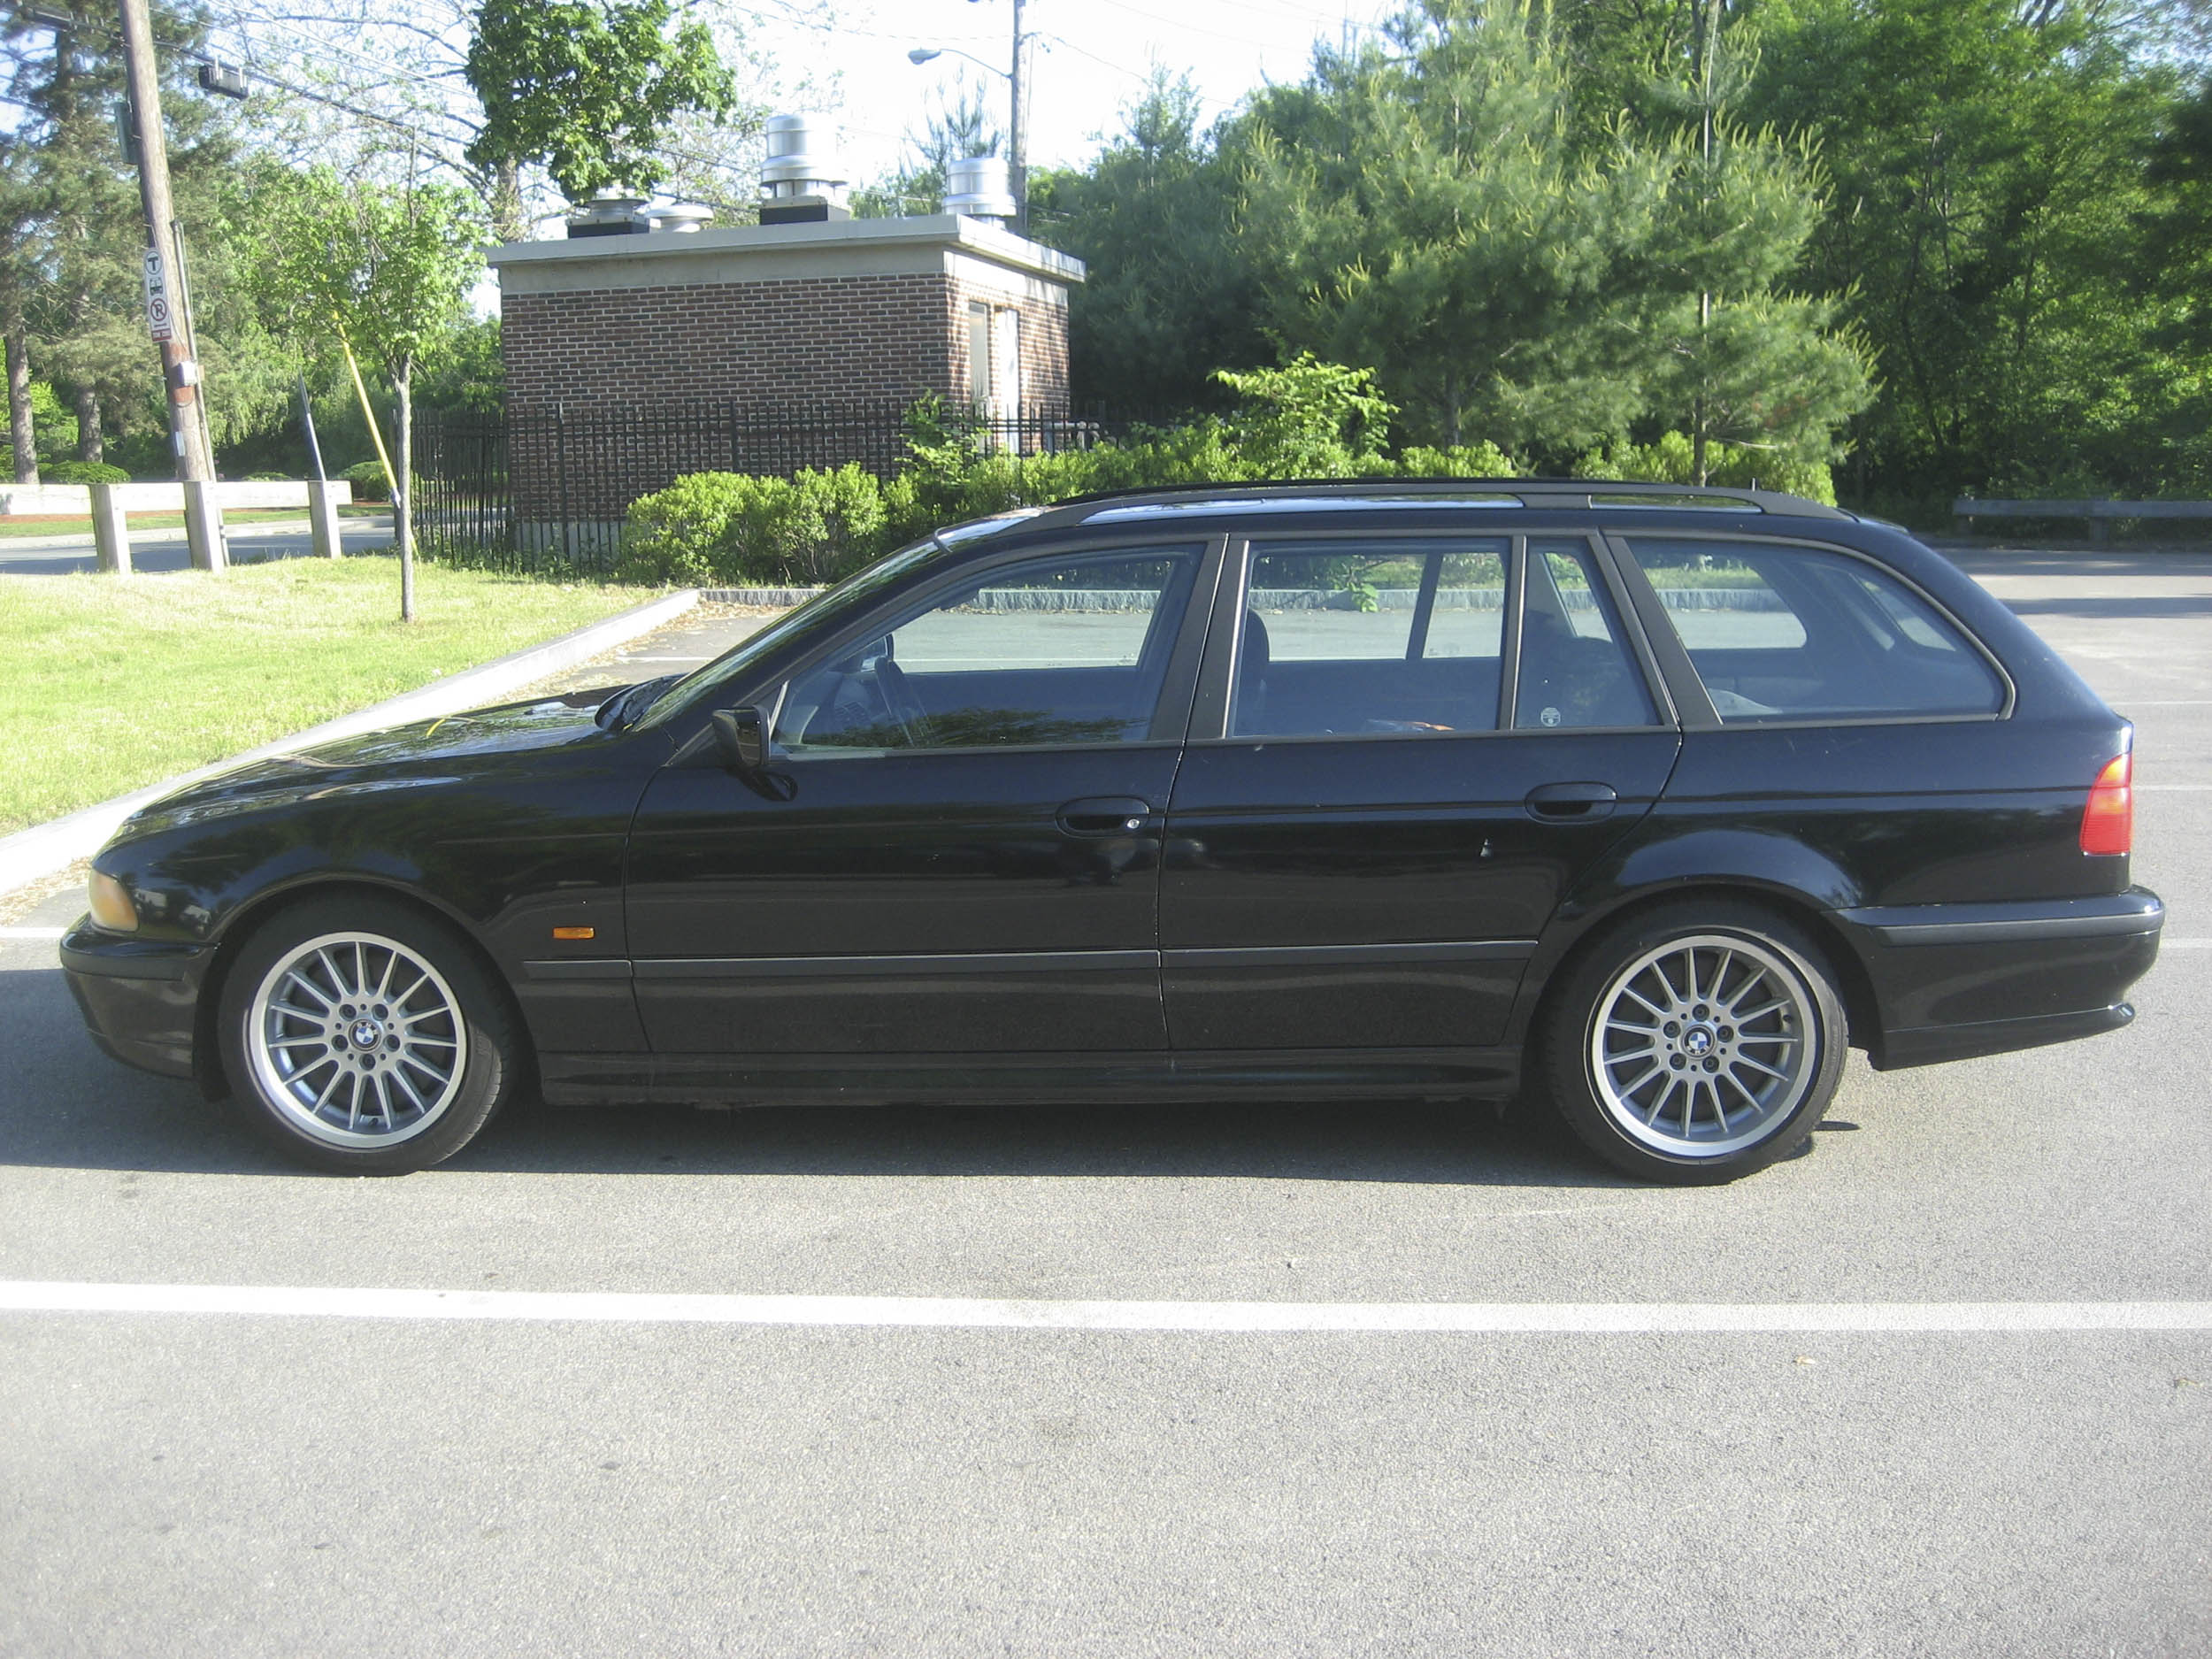 The repair-of-the-week-plan car—my 1999 BMW 528iT sportwagon.